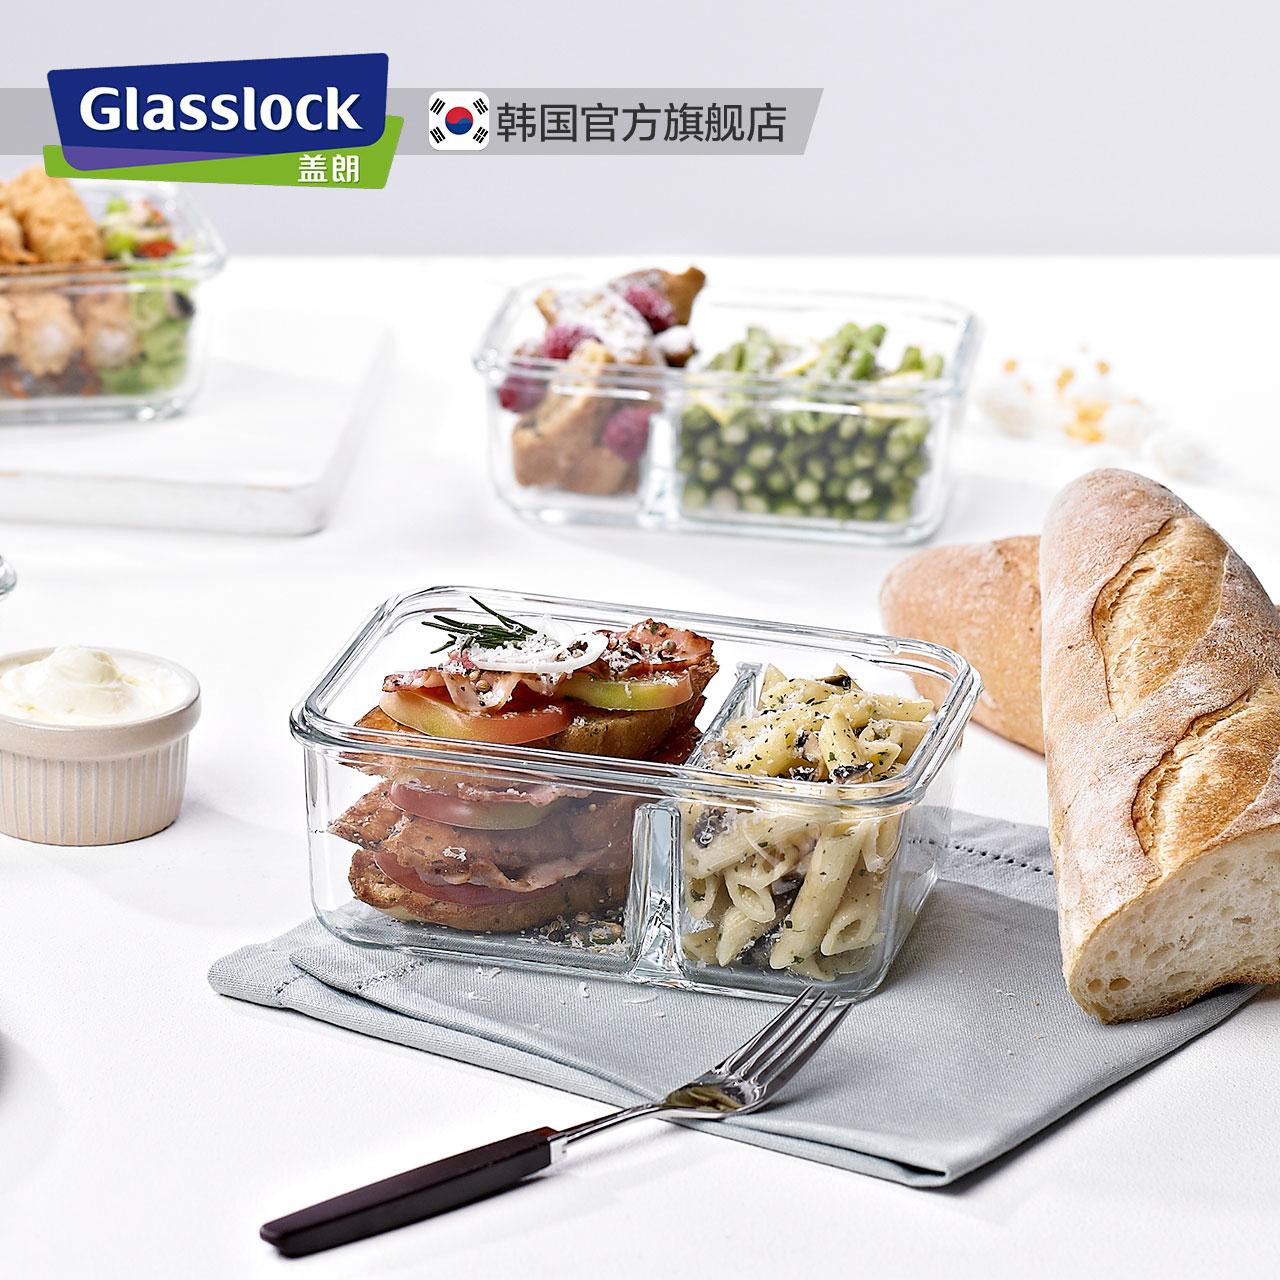 Glasslock微波炉便当盒饭盒分隔耐热钢化玻璃保鲜盒冰箱密封盒